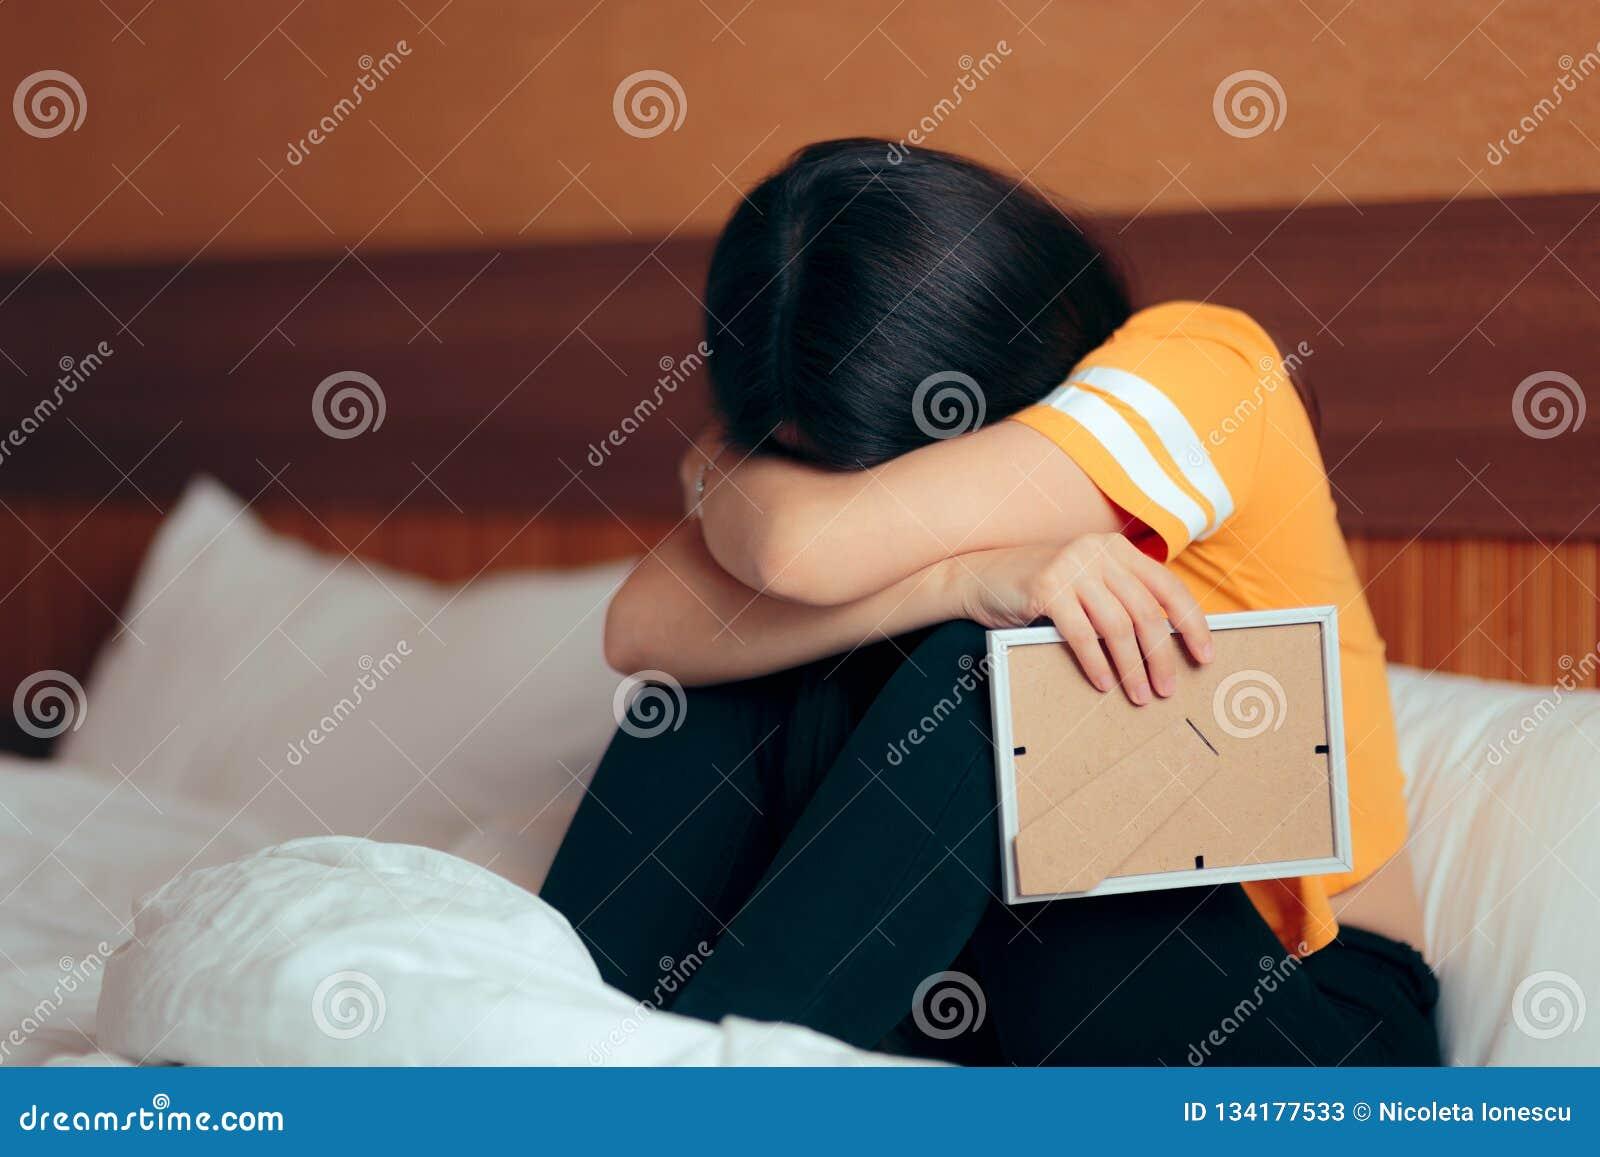 Sad Depressed Girl Crying After Break Up Holding Framed Picture Stock Image Image Of Emotional Dead 134177533